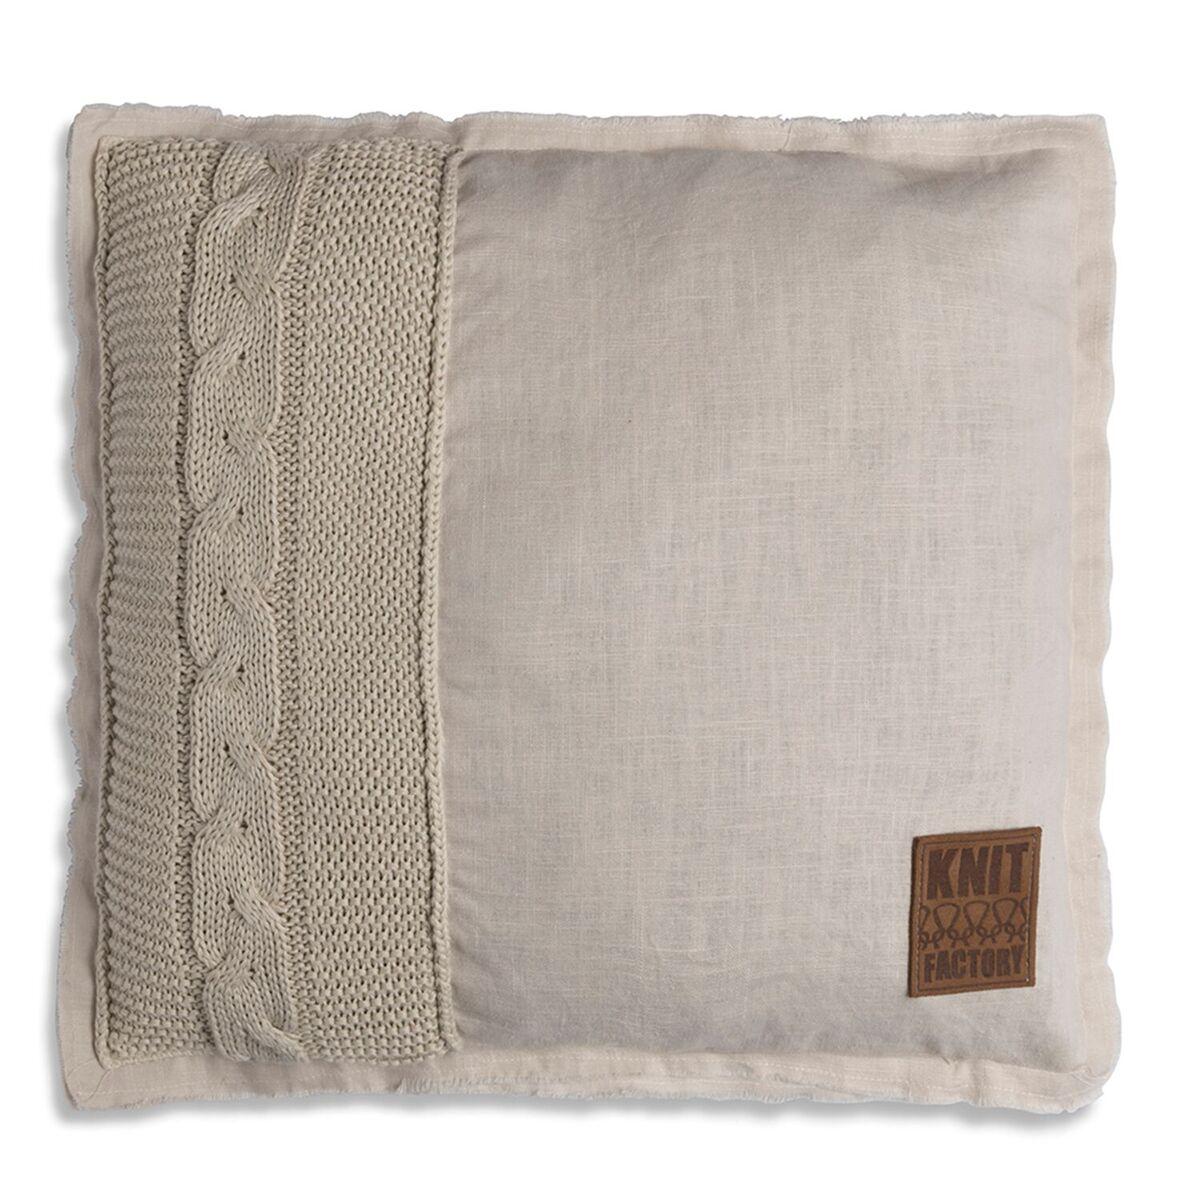 Knit Factory kussen Jill 't Maaseiker Woonhuys